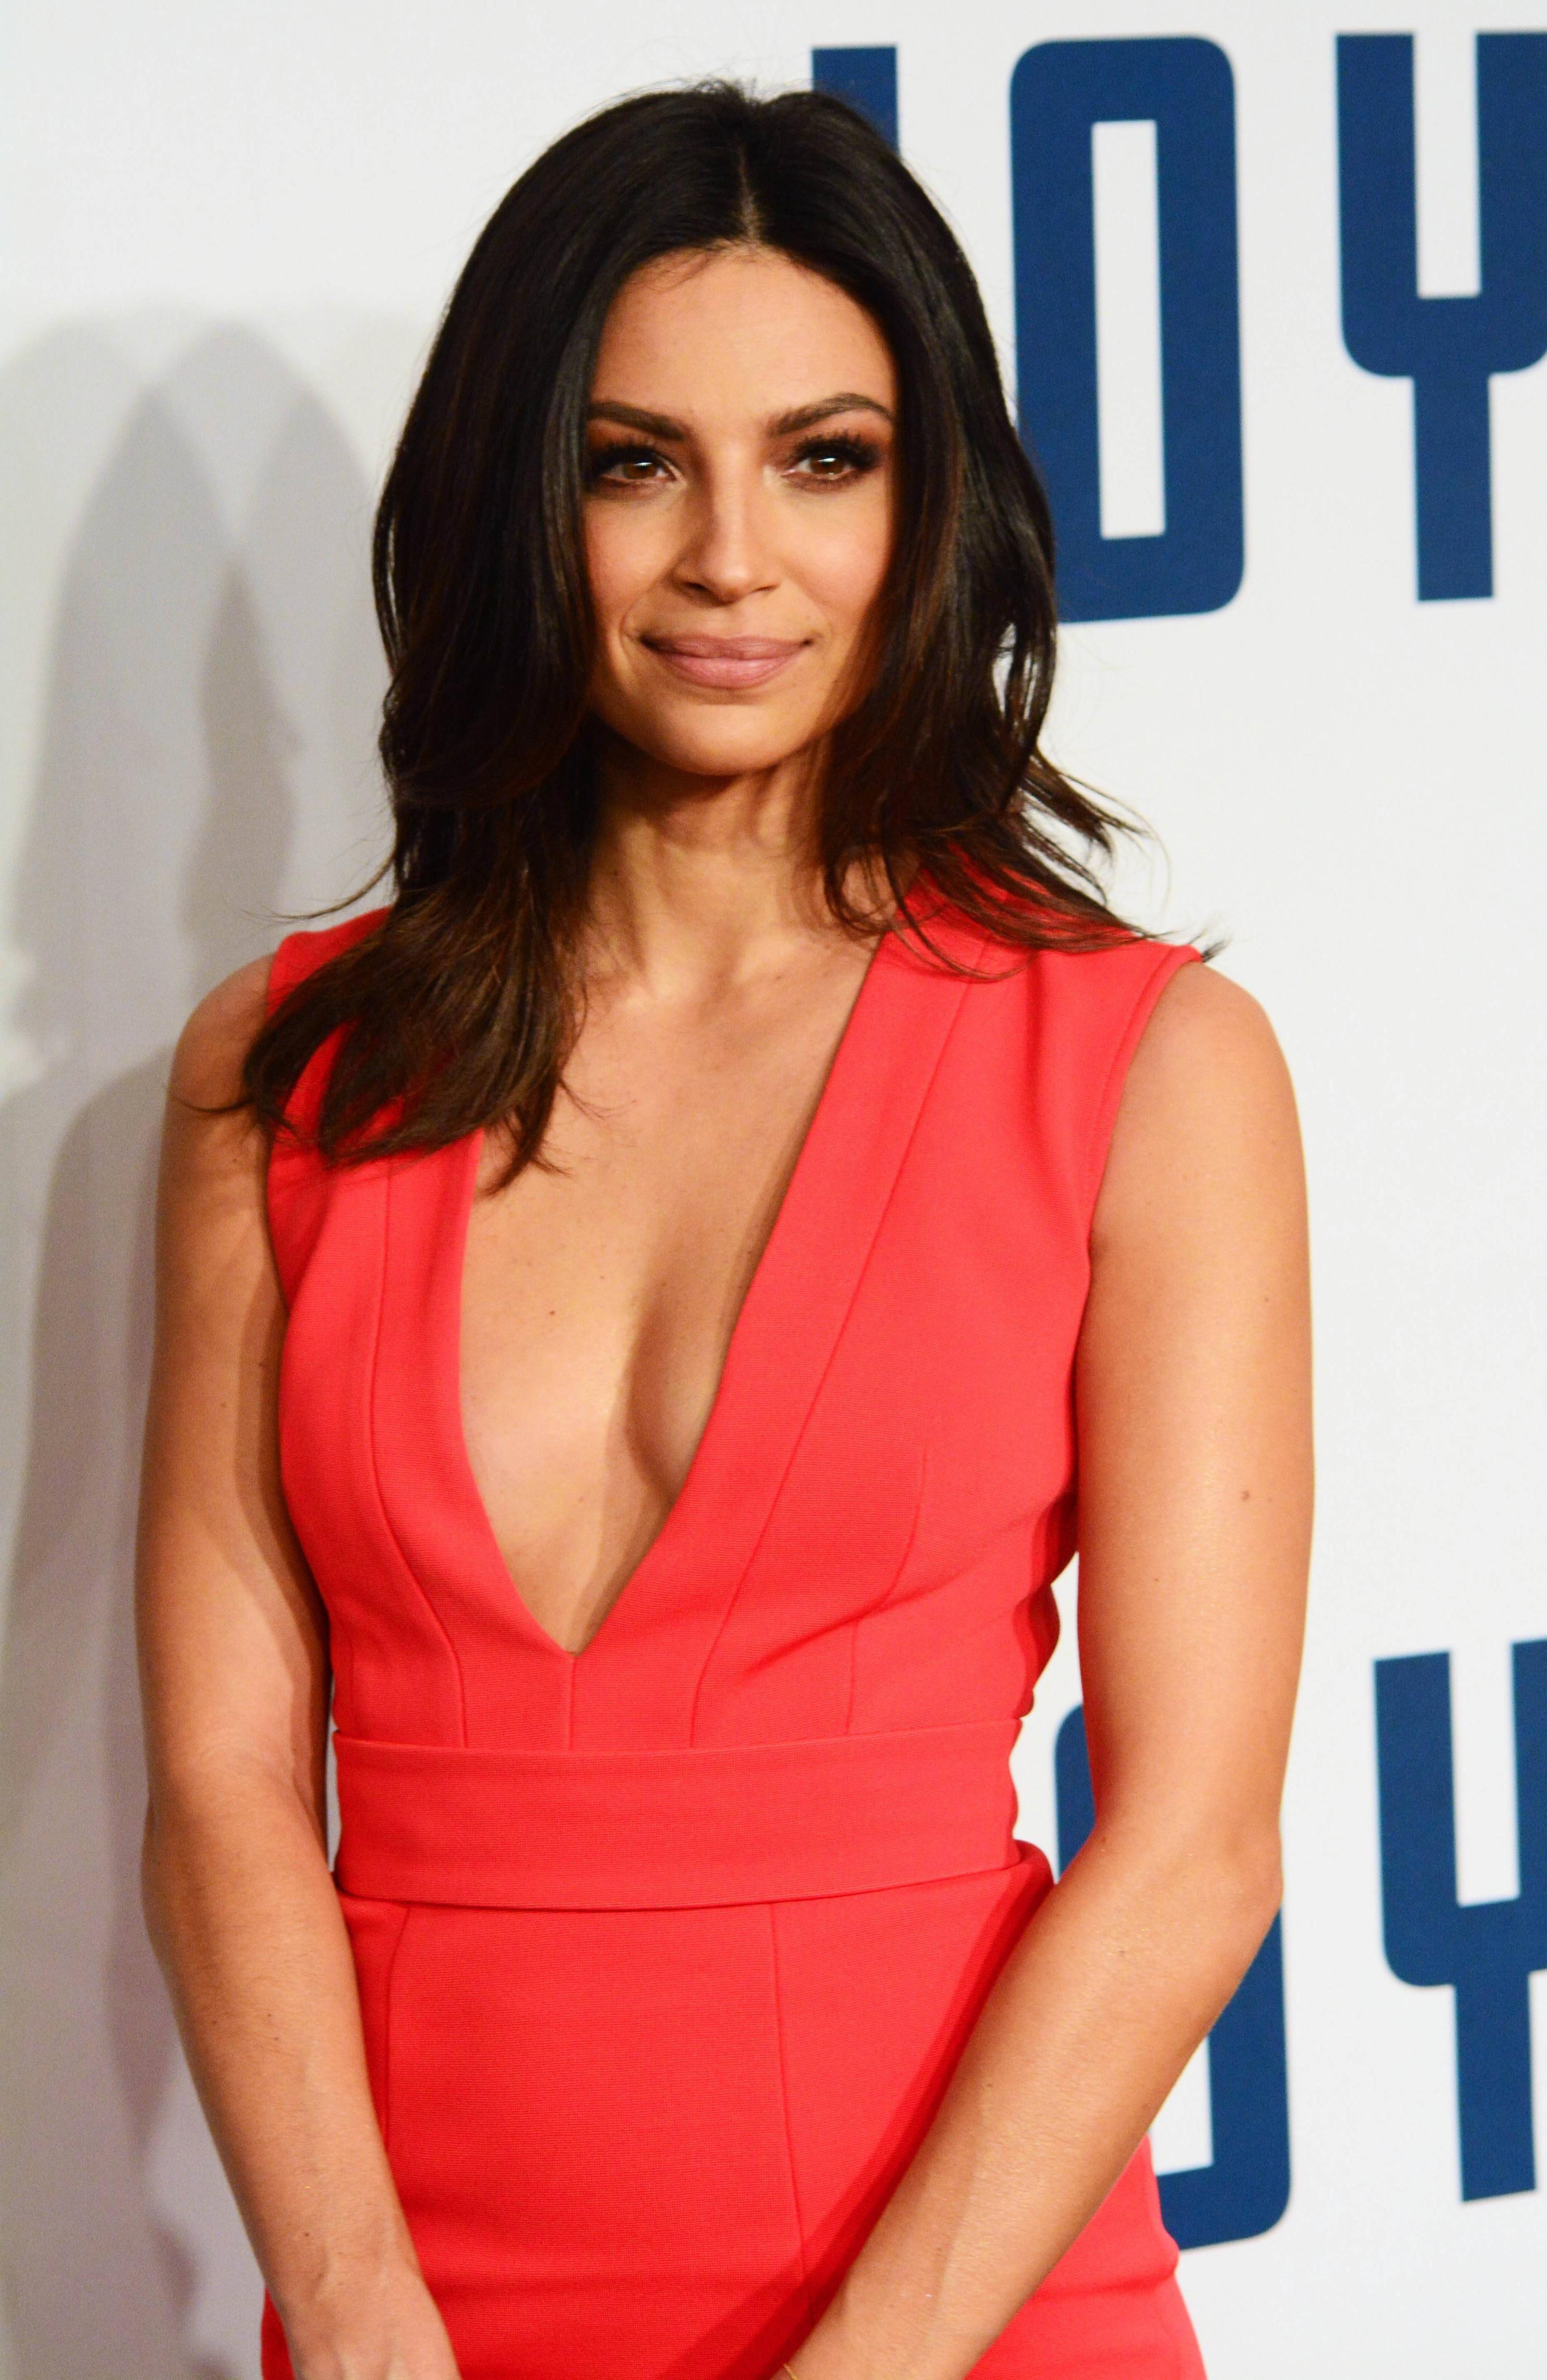 Pin By Kingofkings On Female Celebrities  Floriana Lima